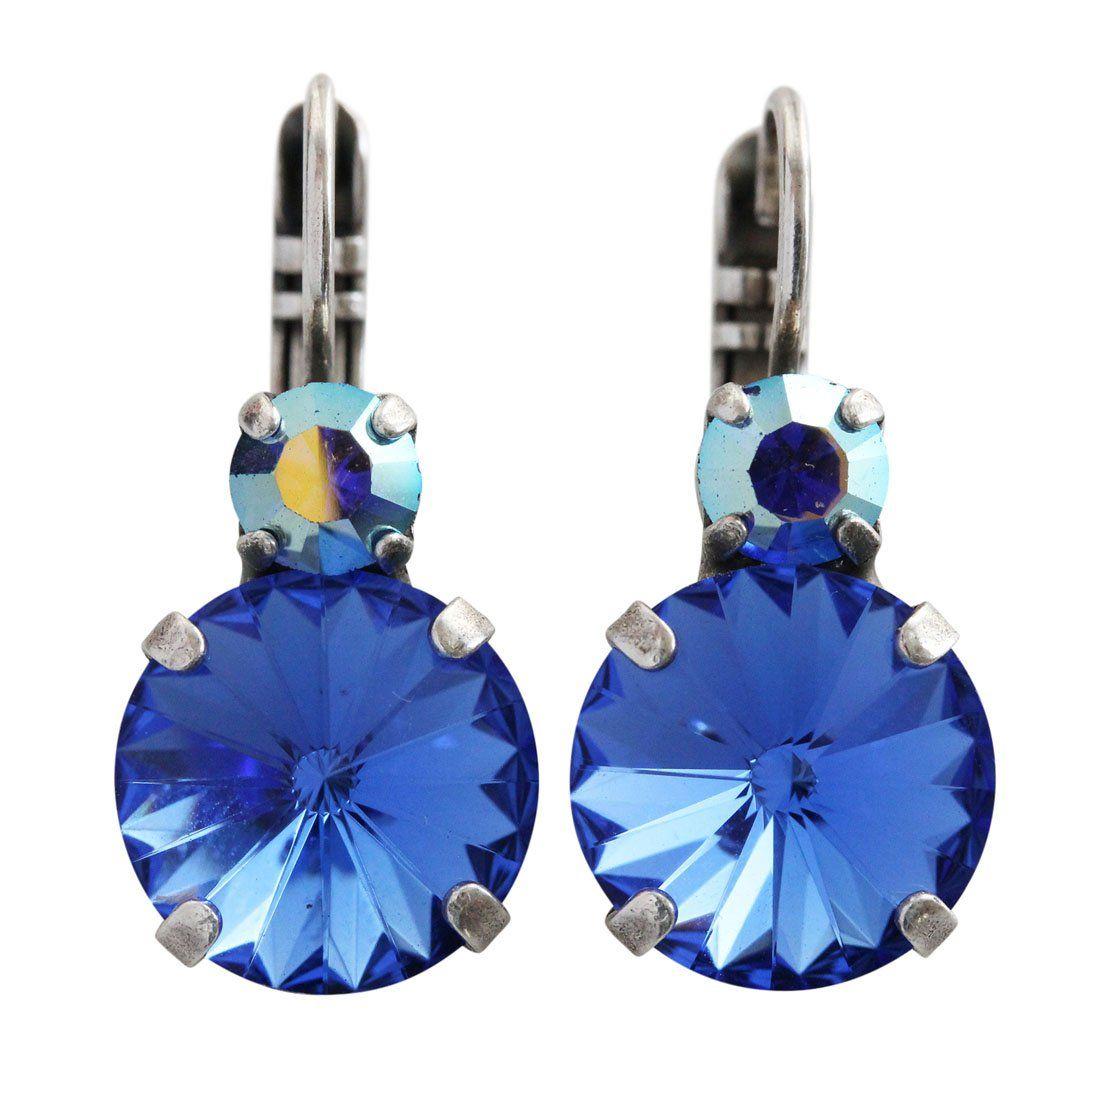 42bb769a3ce64 Mariana in 2019 | Products | Mariana jewelry, Swarovski crystal ...